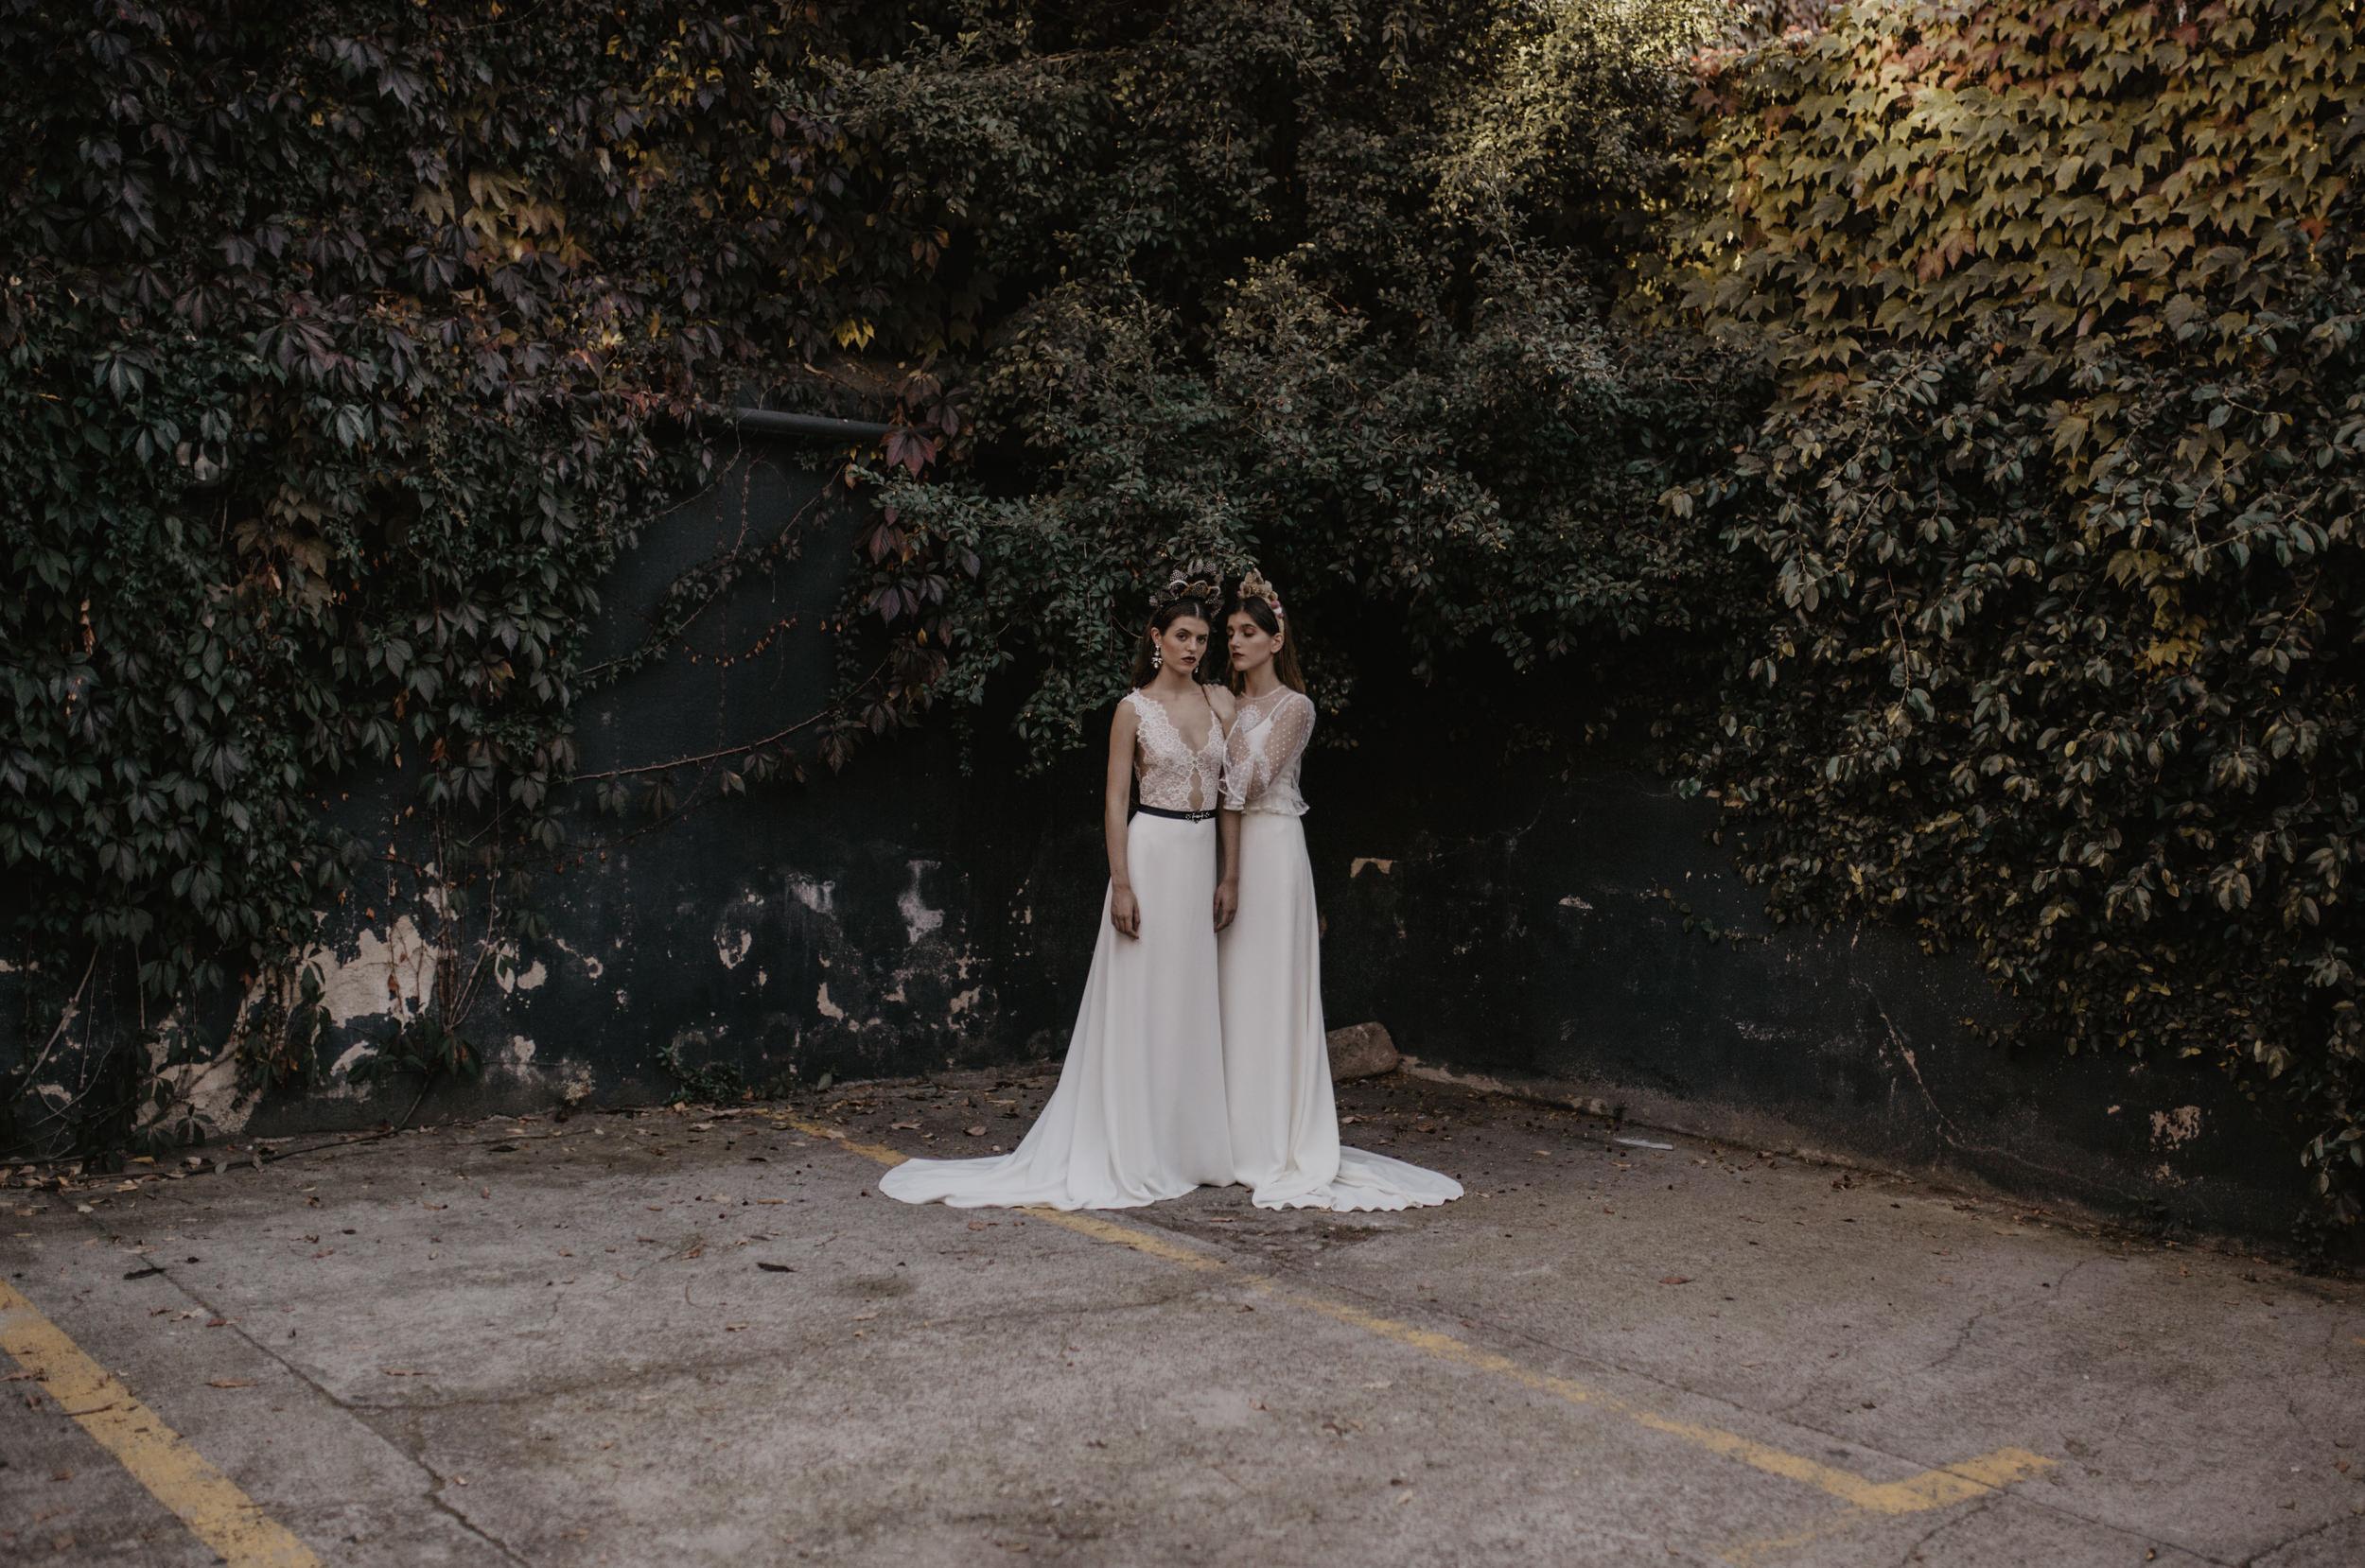 thenortherngirlphotography_photography_thenortherngirl_rebeccascabros_wedding_weddingphotography_weddingphotographer_barcelona_fashionbarcelona_unconventionalwedding_lacasademuñecas-211.jpg